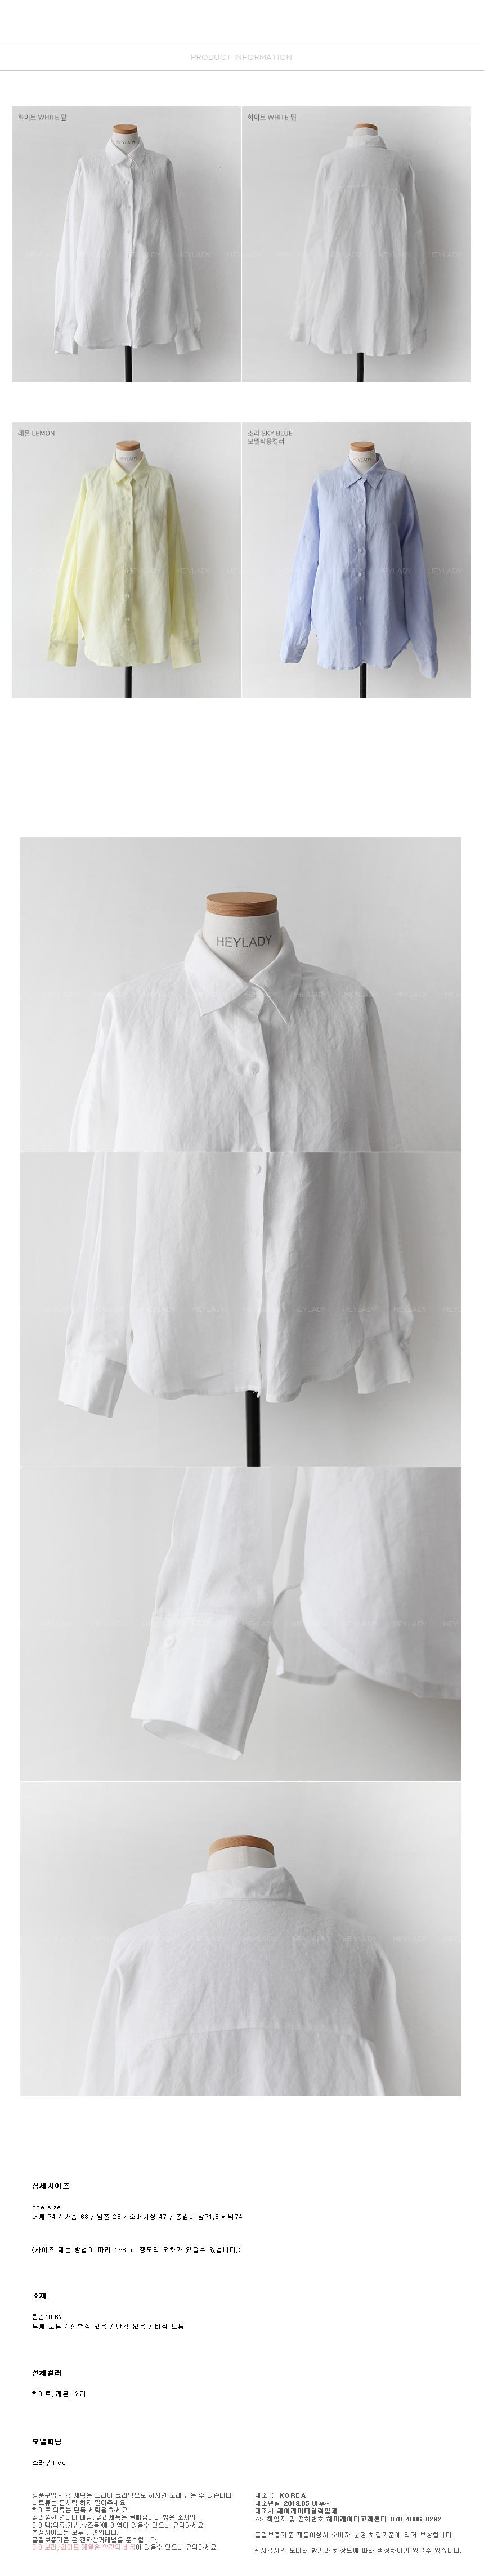 Moje o Buffett linen shirt